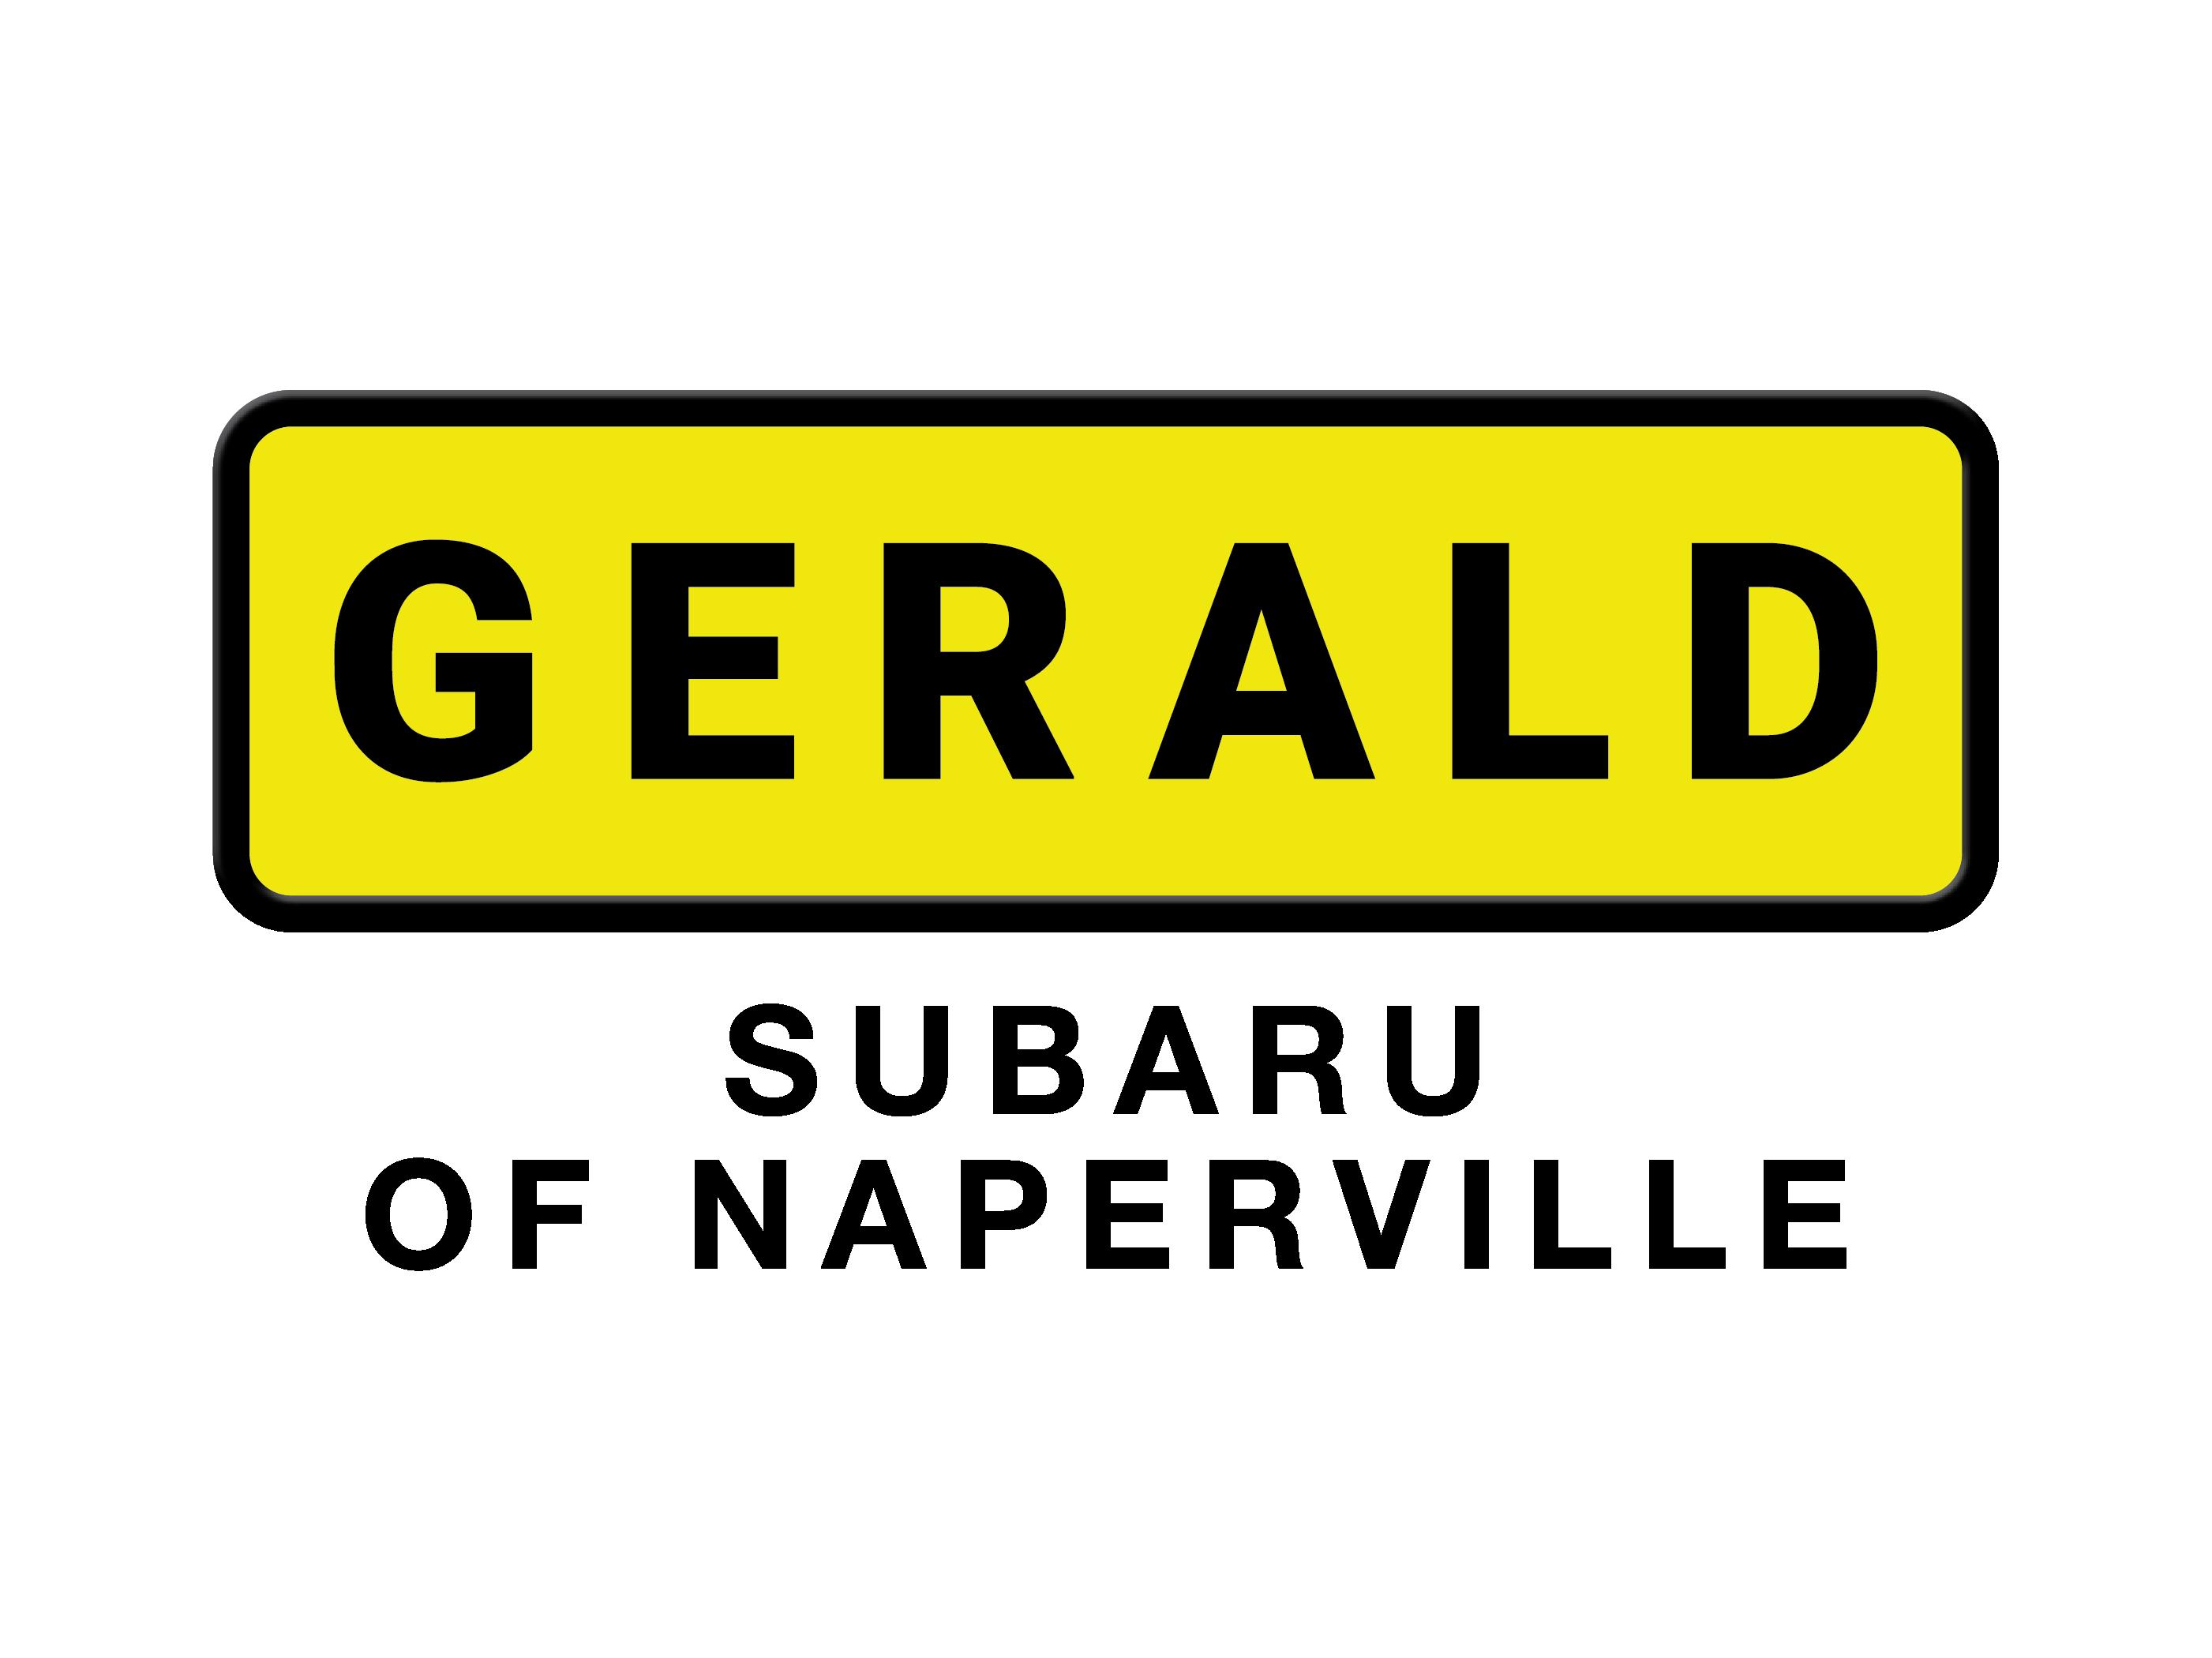 gerald subaru logo